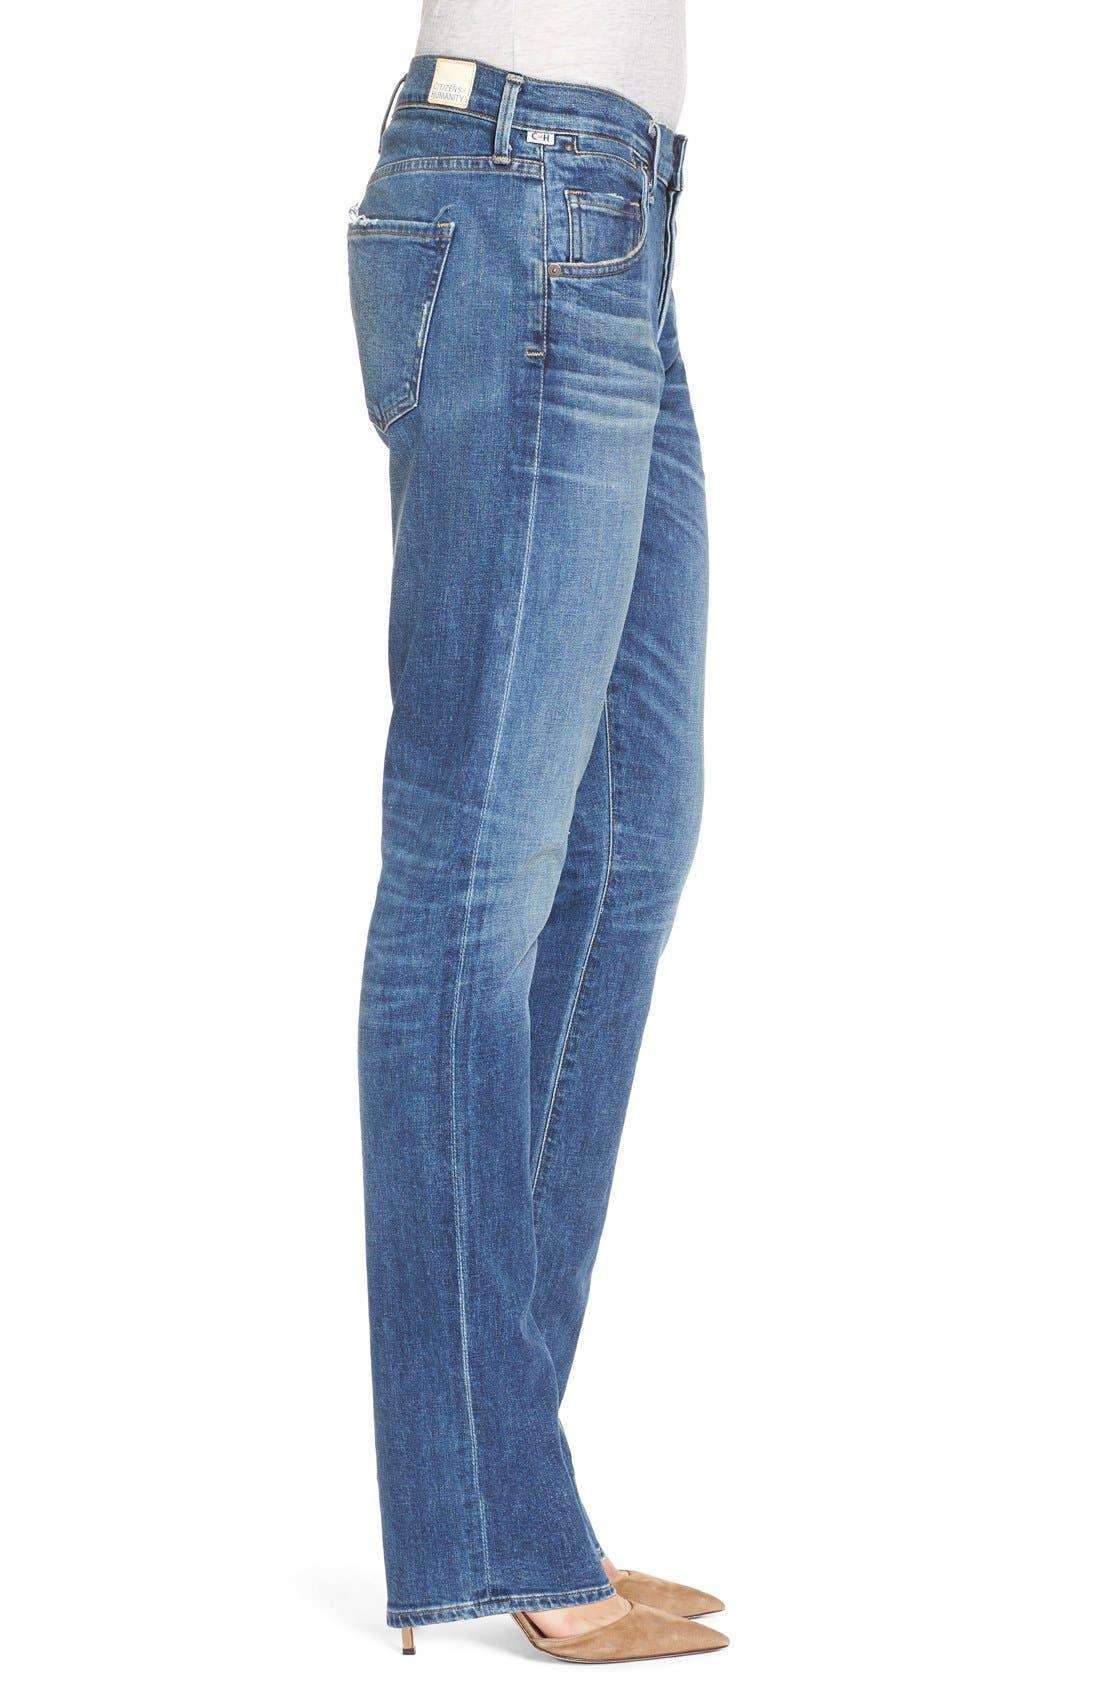 'Emerson Long' Slim Boyfriend Jeans,                             Alternate thumbnail 3, color,                             Blue Mountain